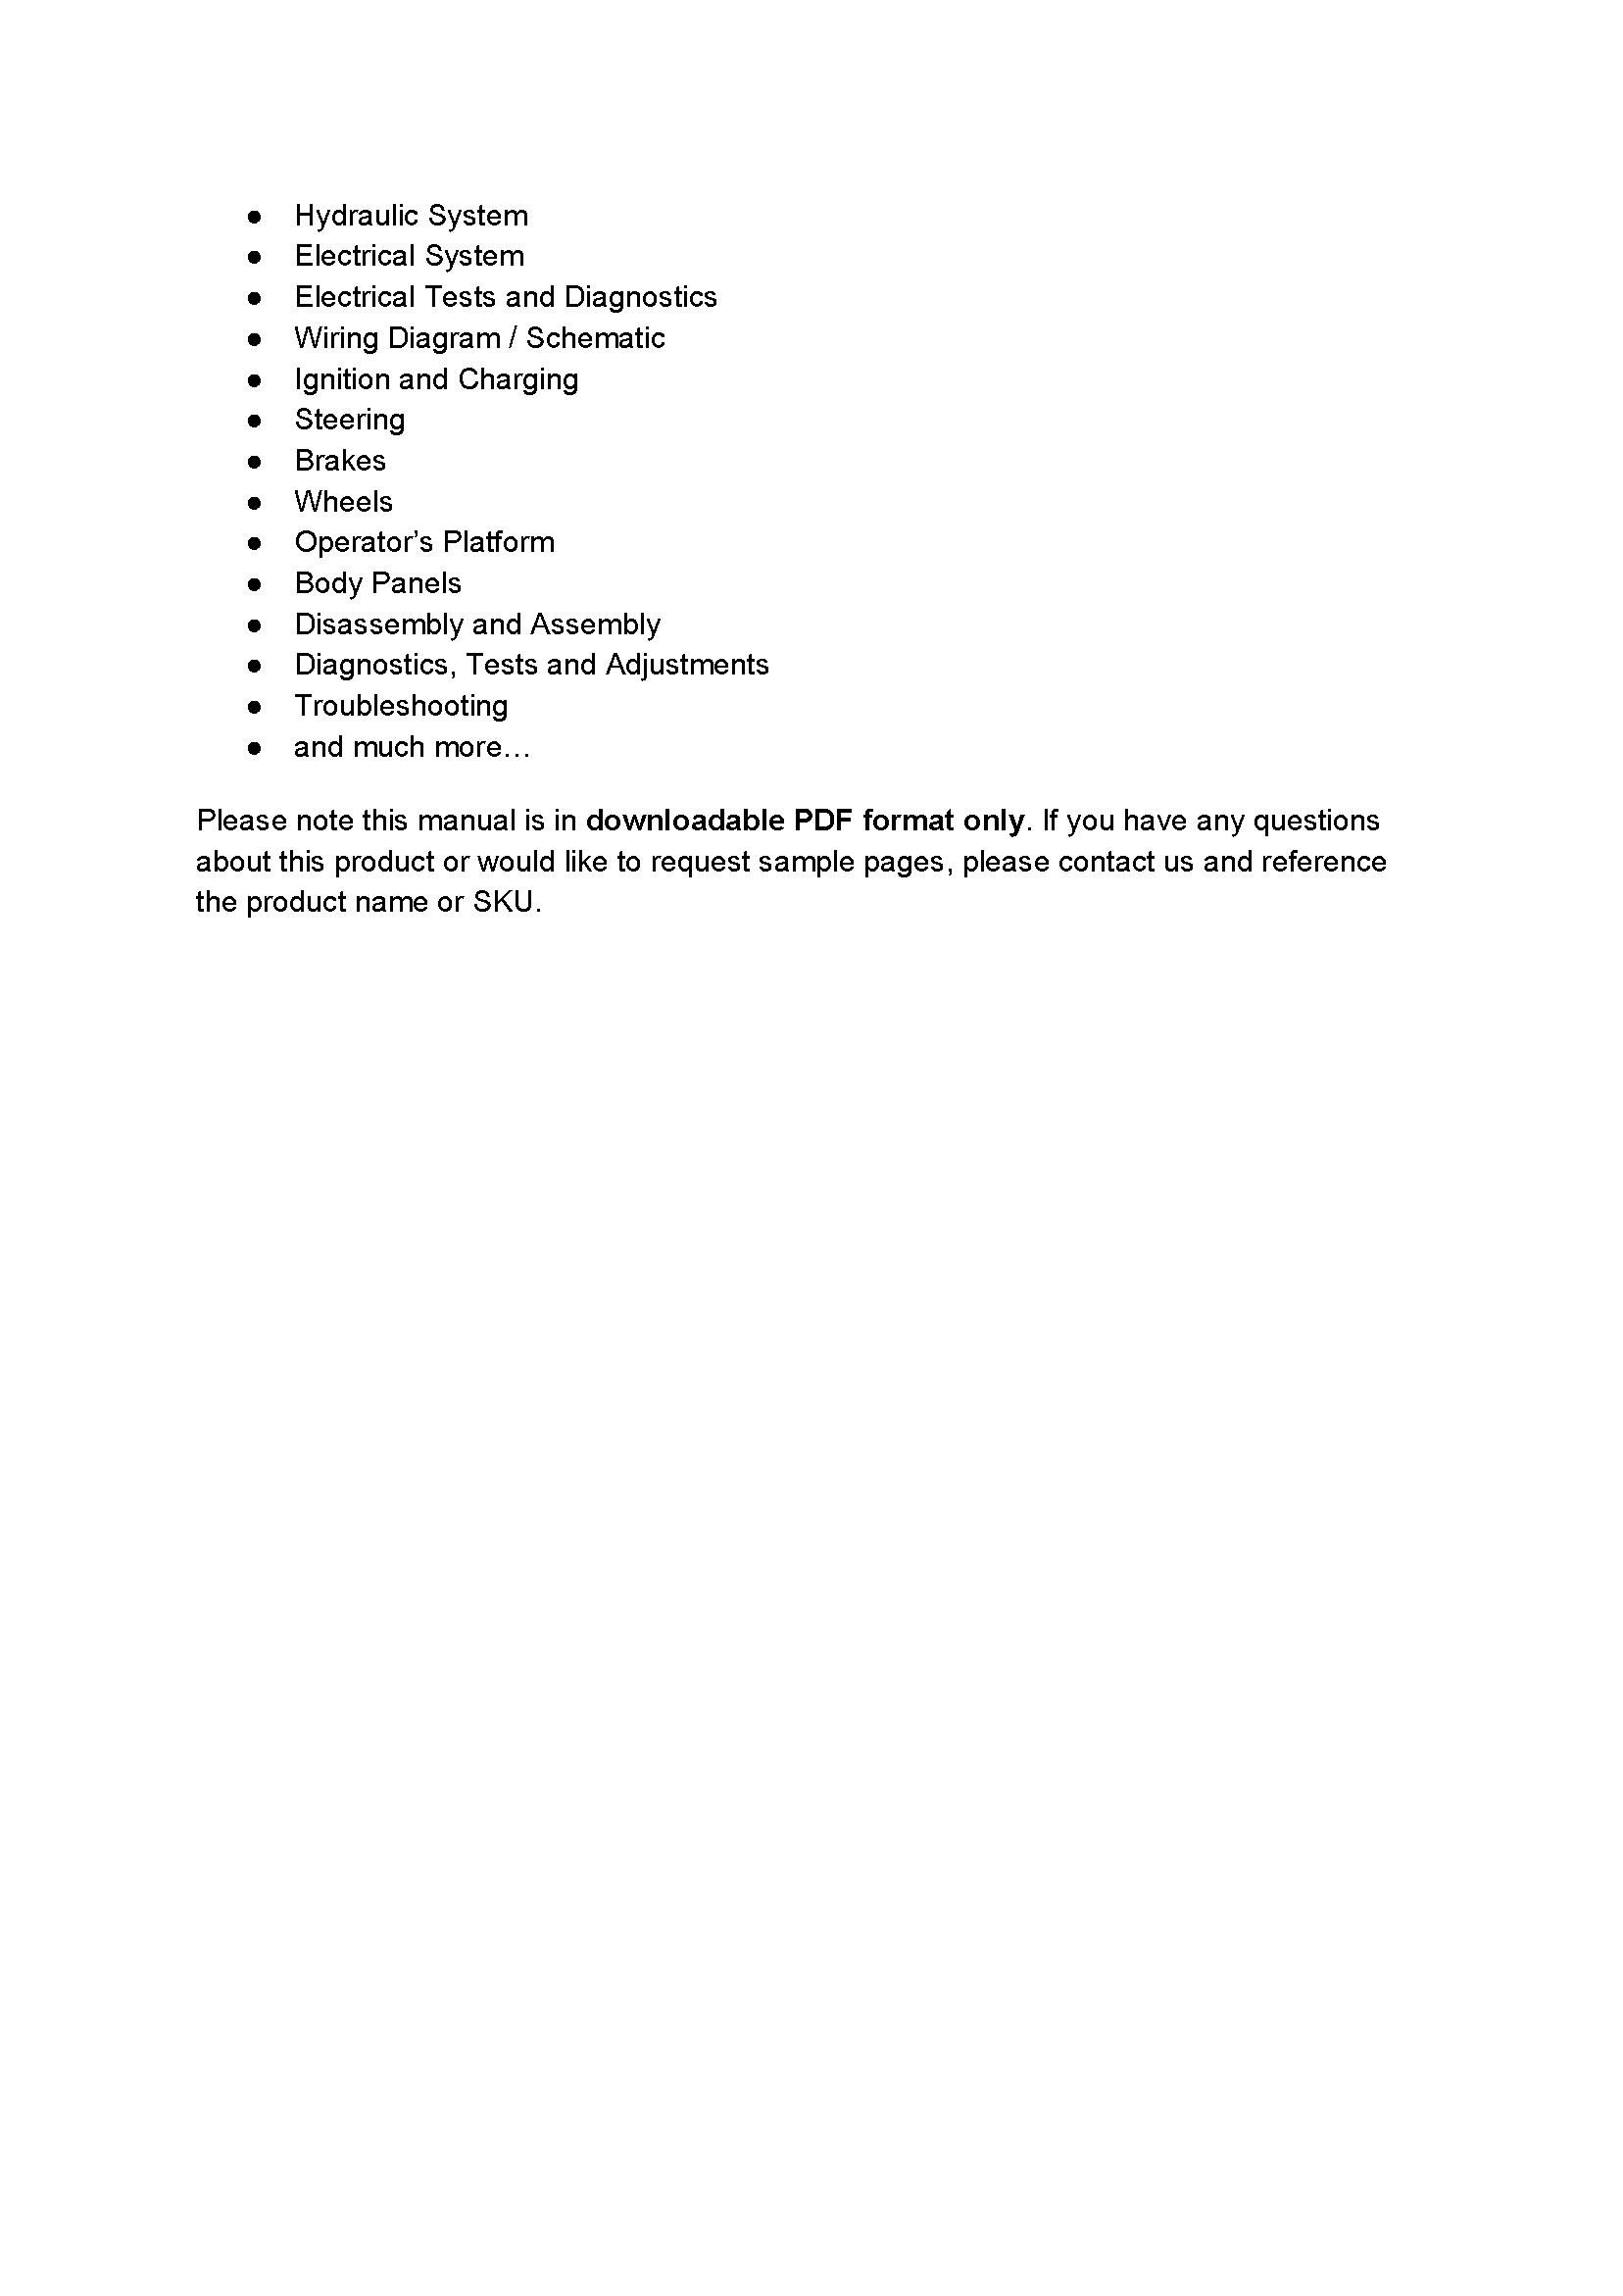 John Deere X354 manual